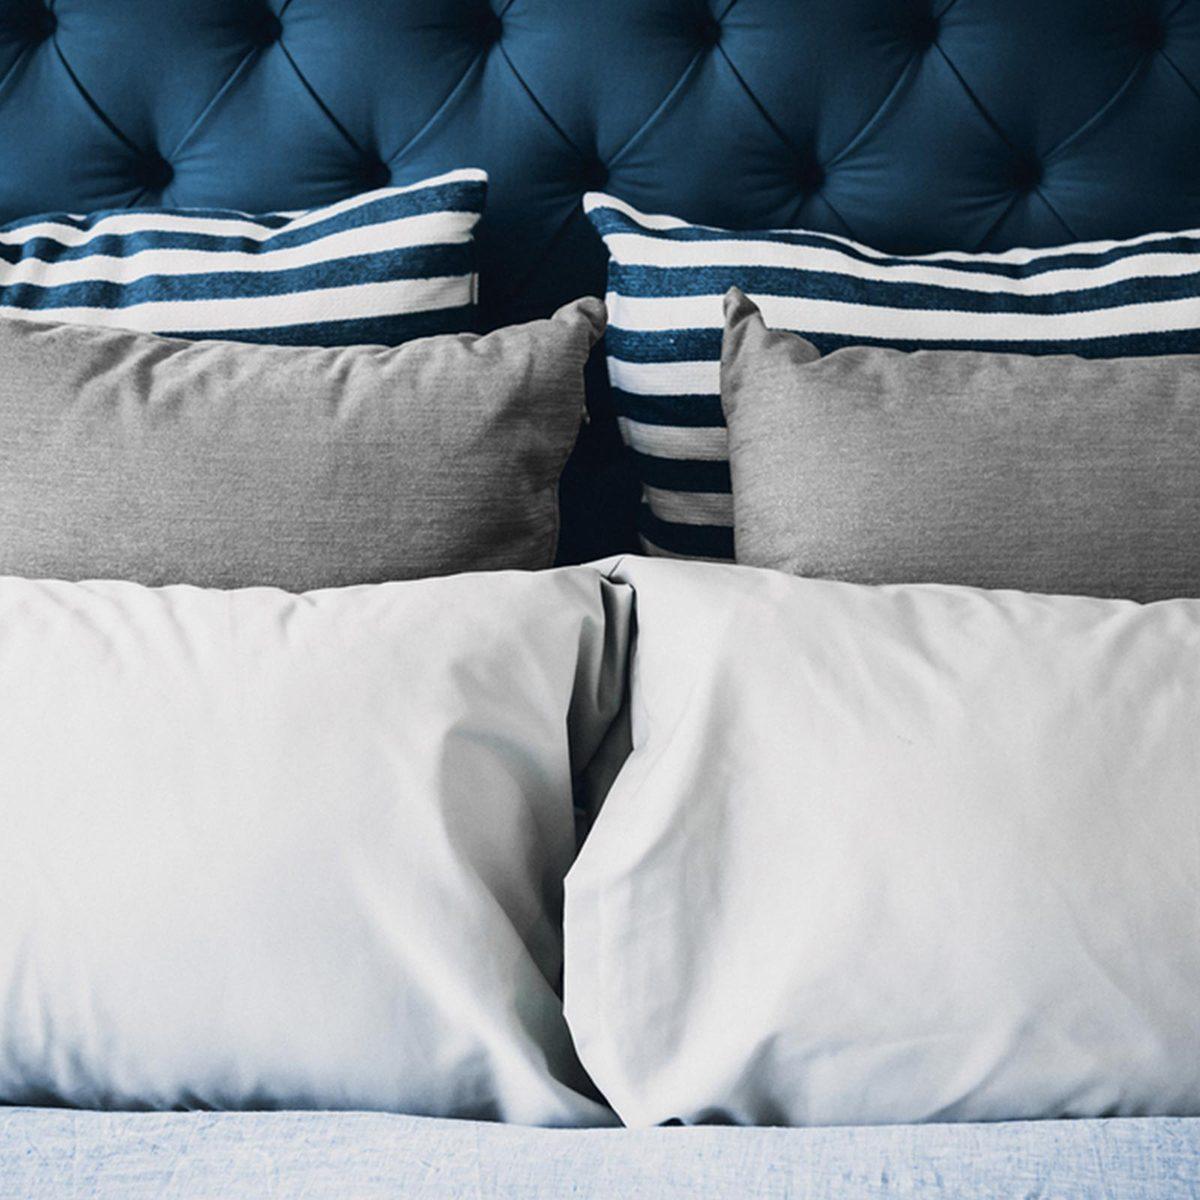 Multiple pillows